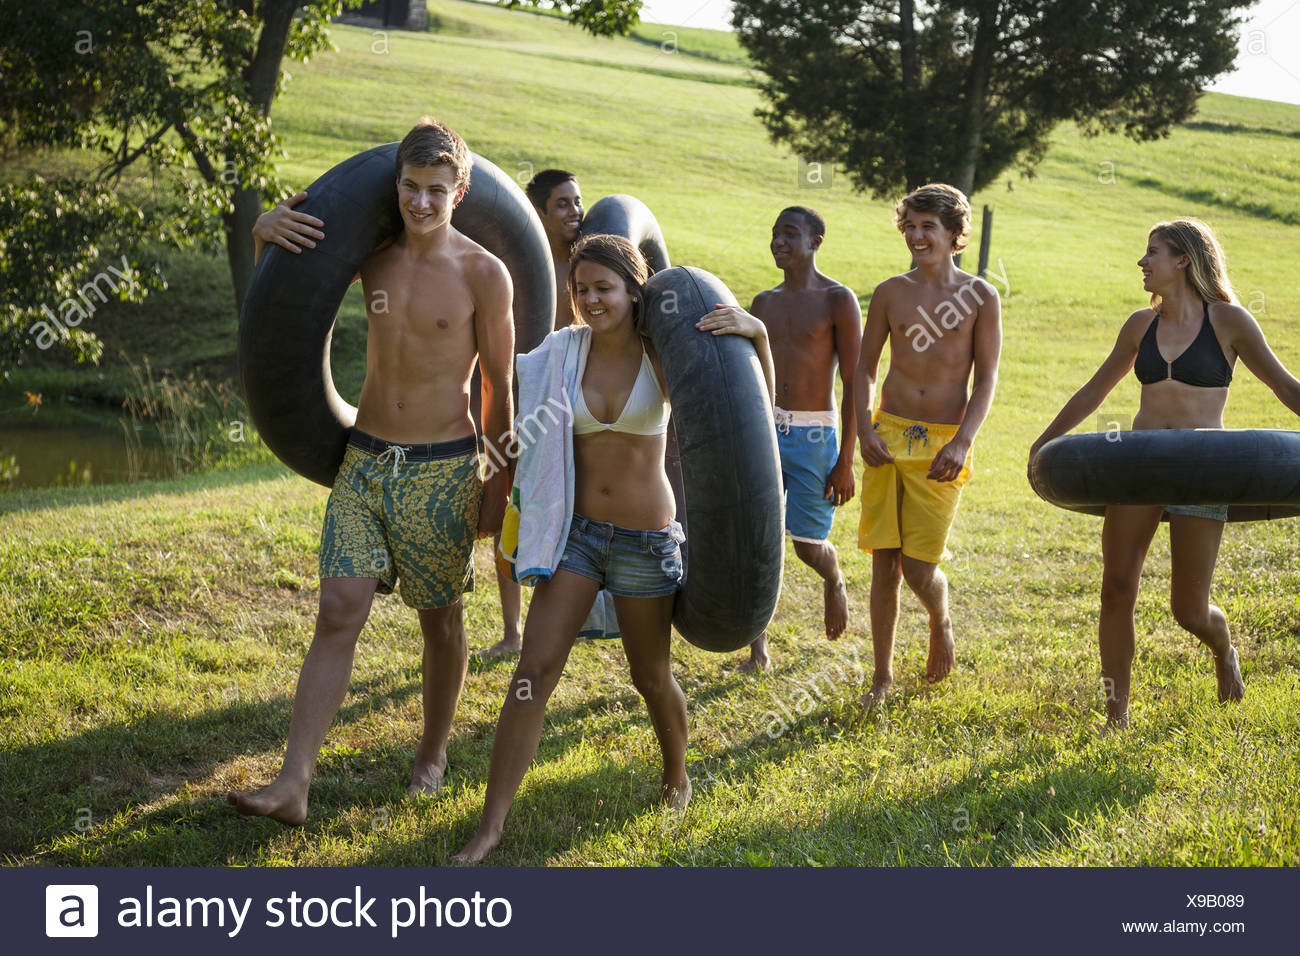 Maryland USA boys and girls holding towels swim floats for swim - Stock Image